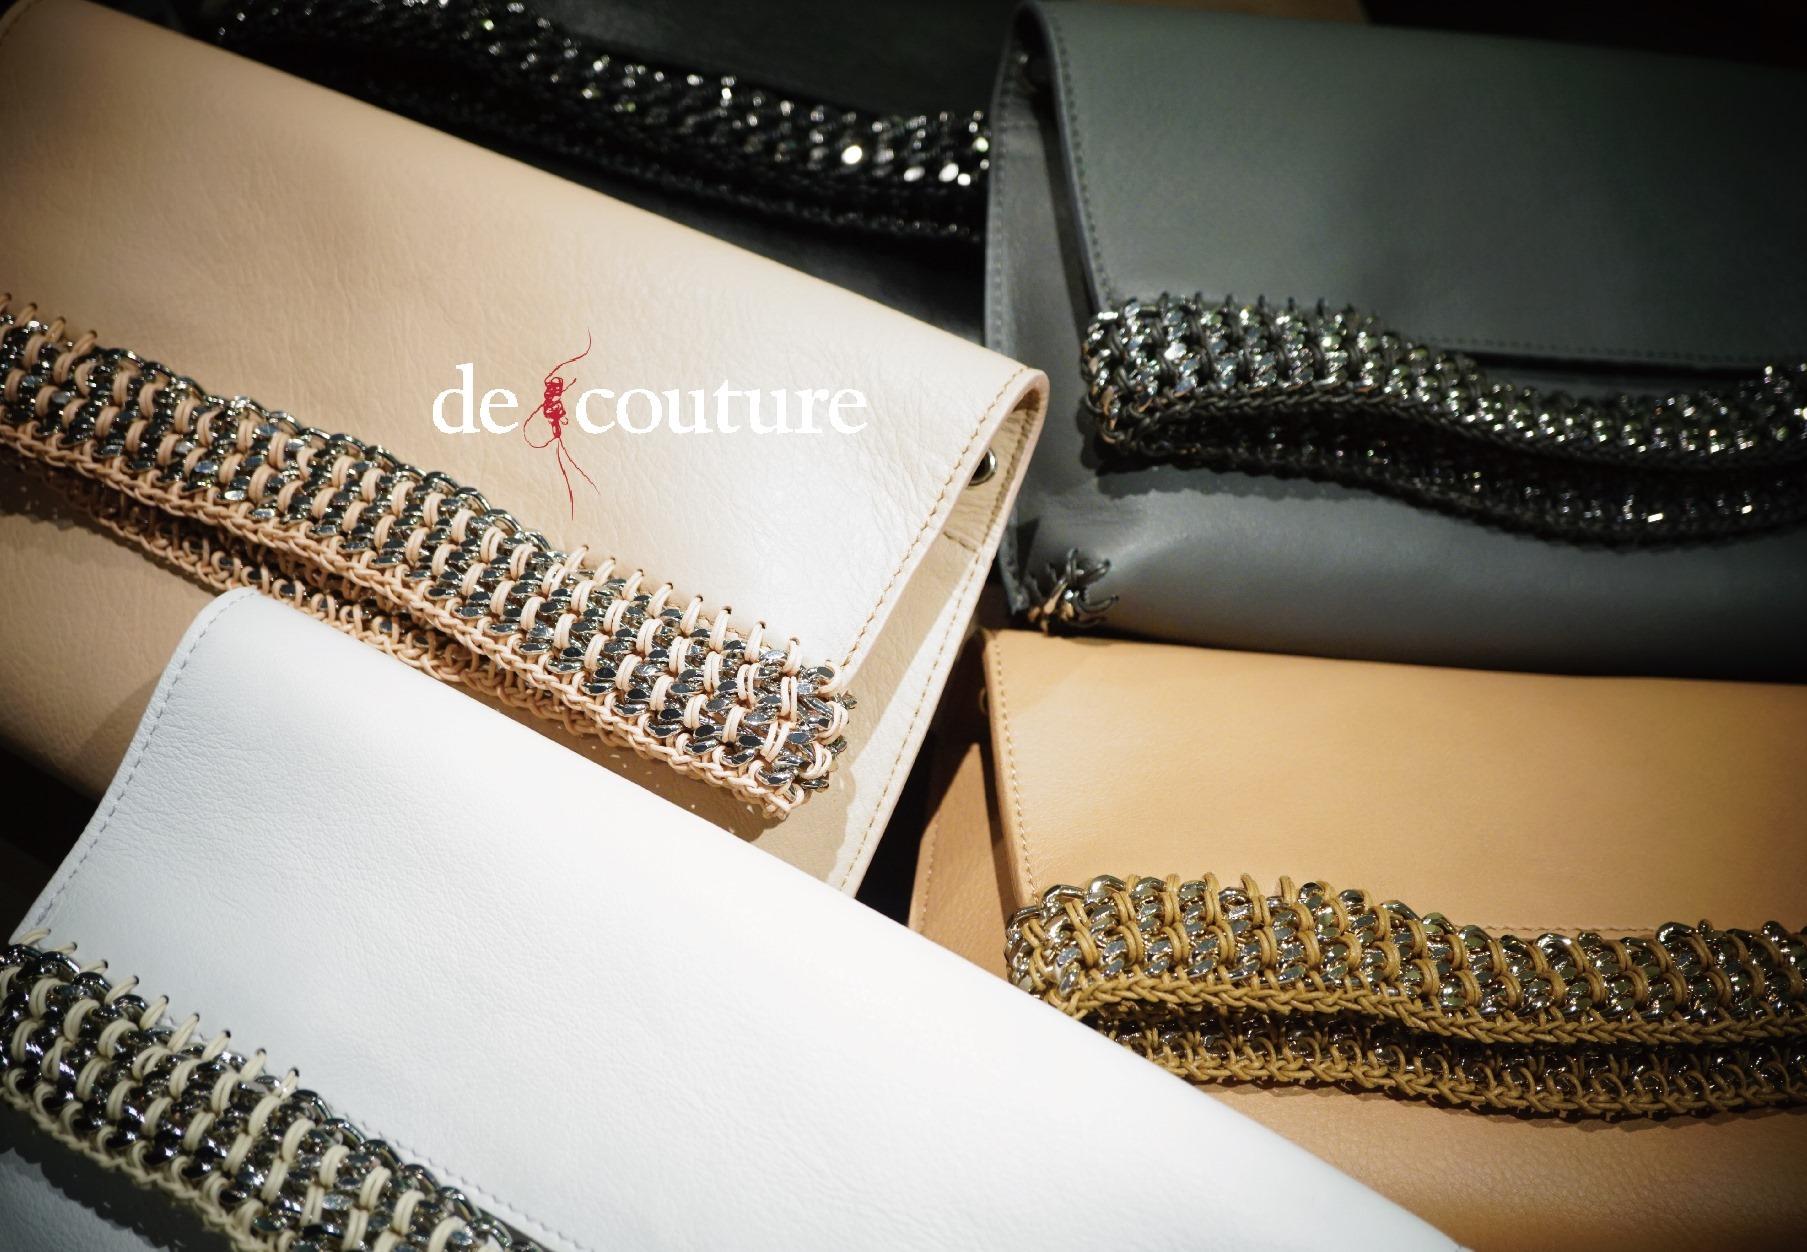 de couture 新作3WAYクラッチ_b0115615_14582030.jpg